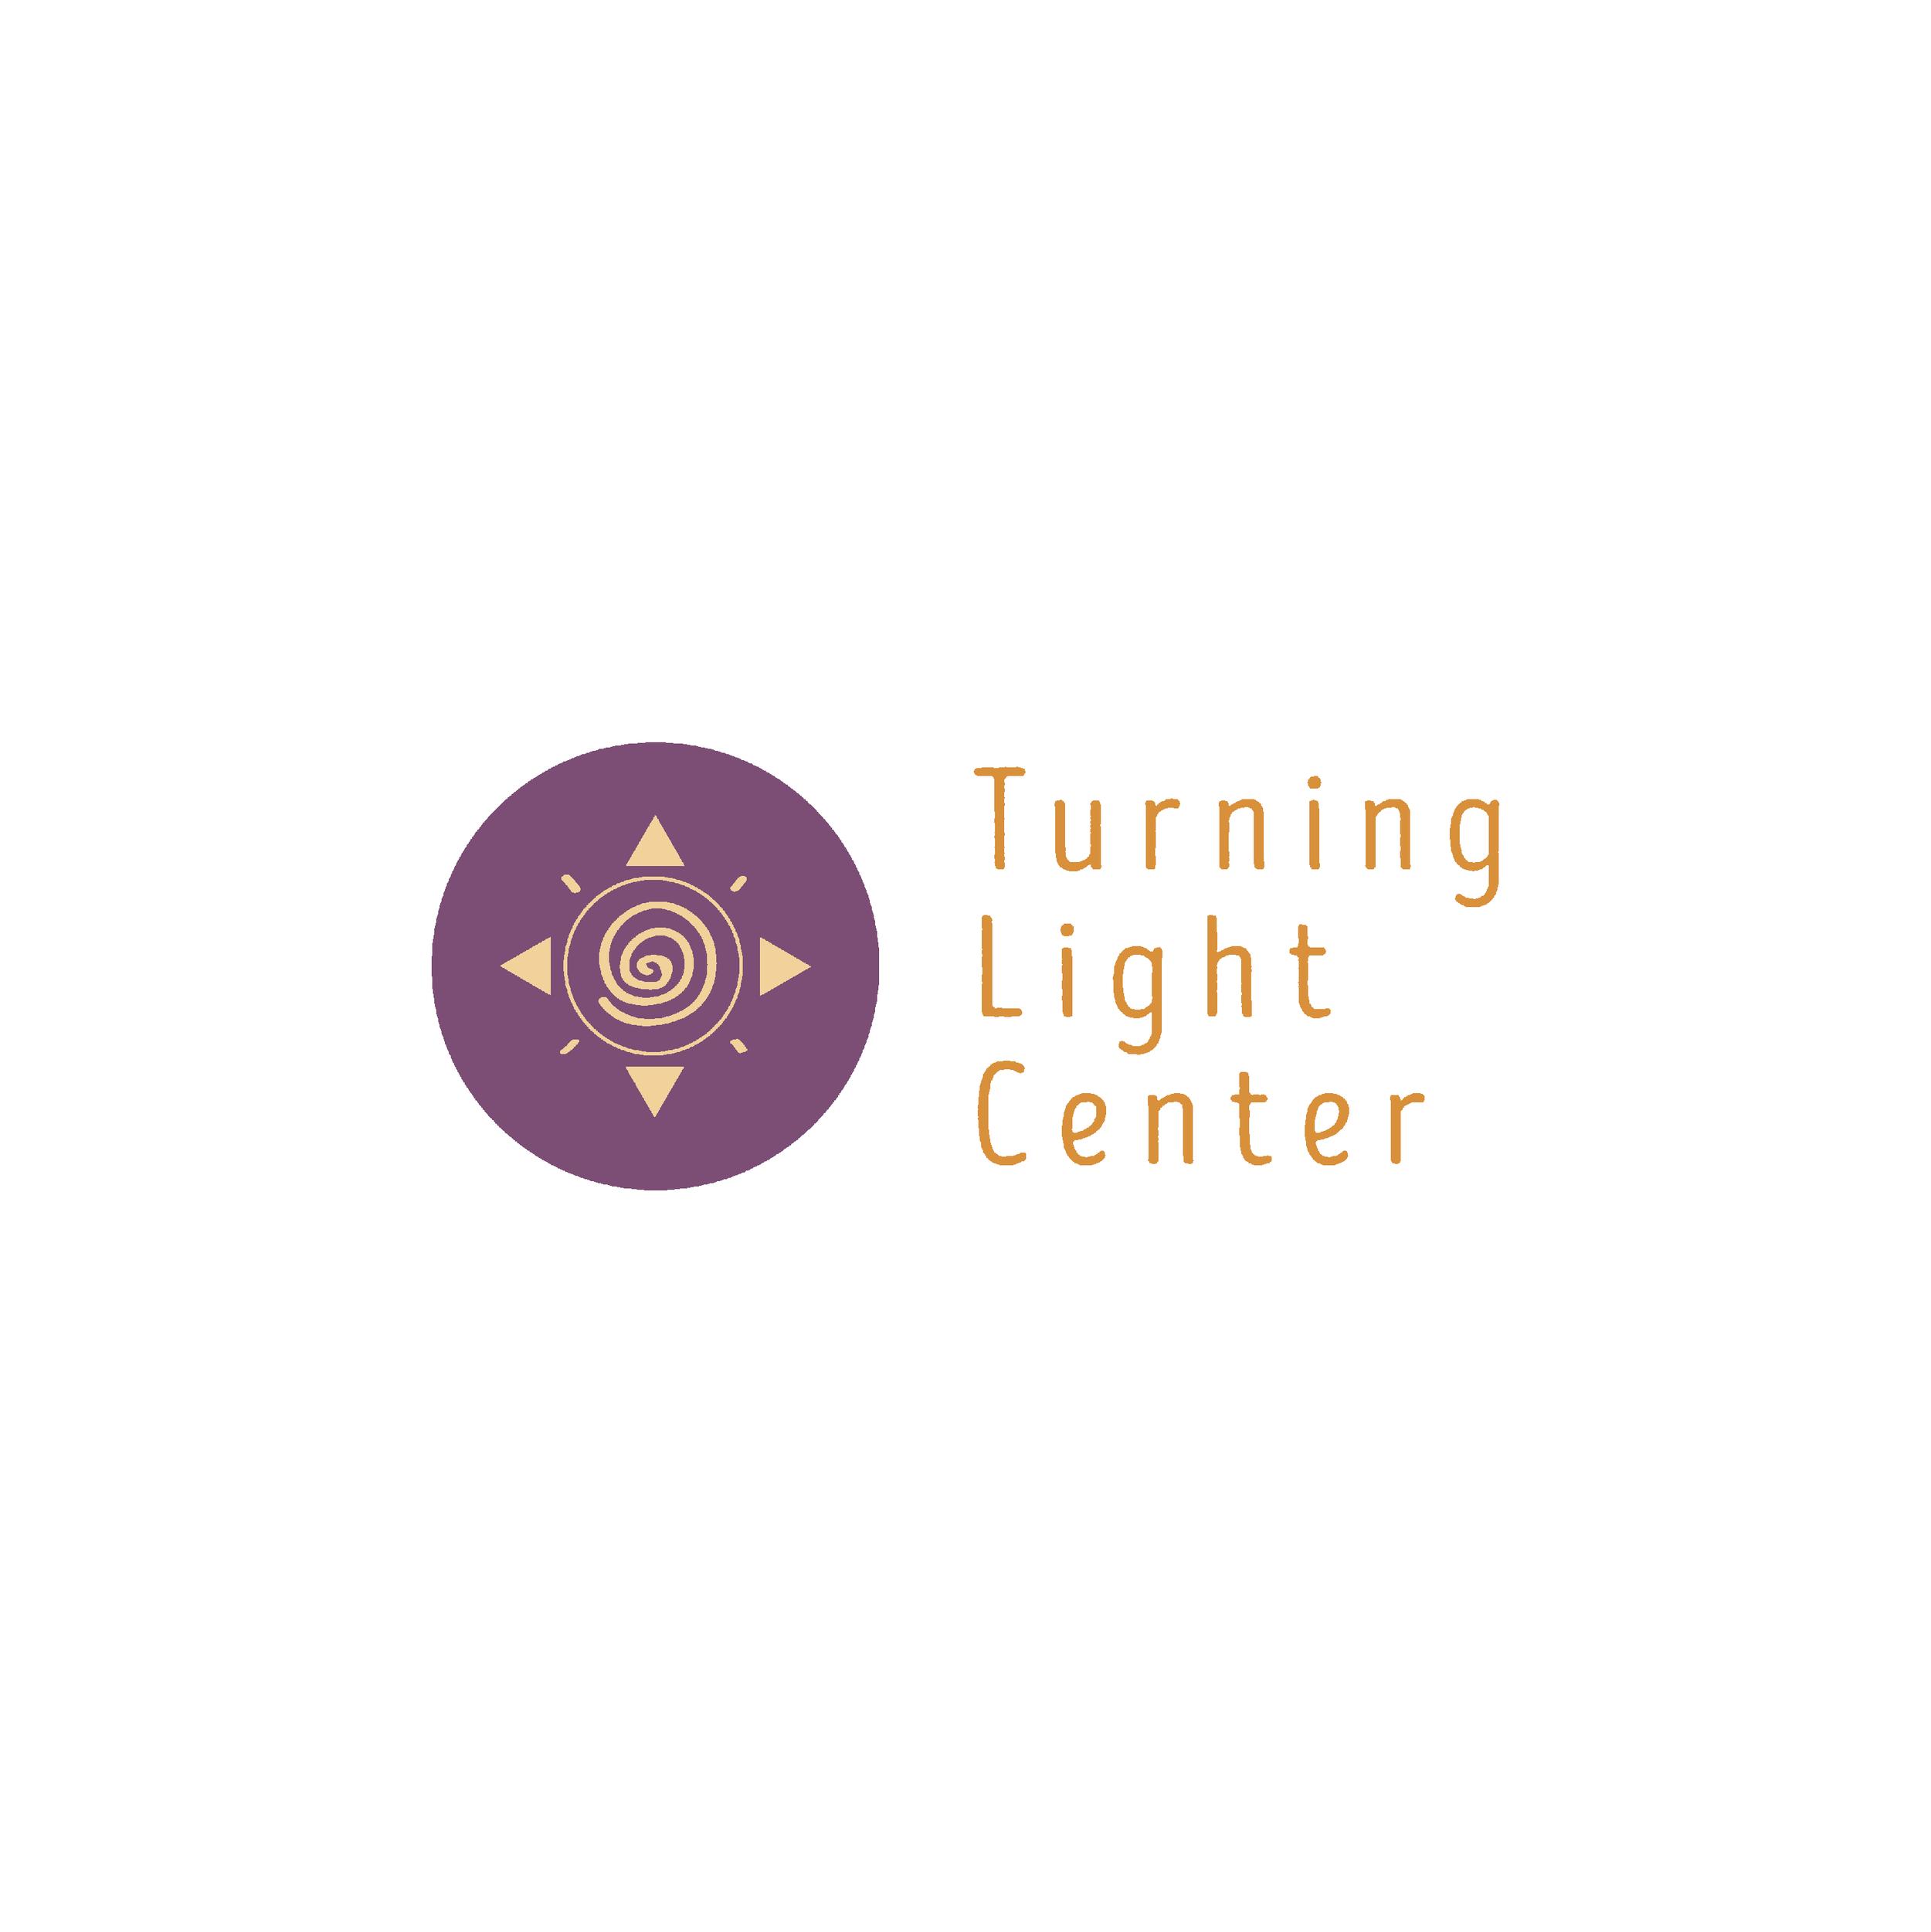 Portfolio_TurningLightCenter.png